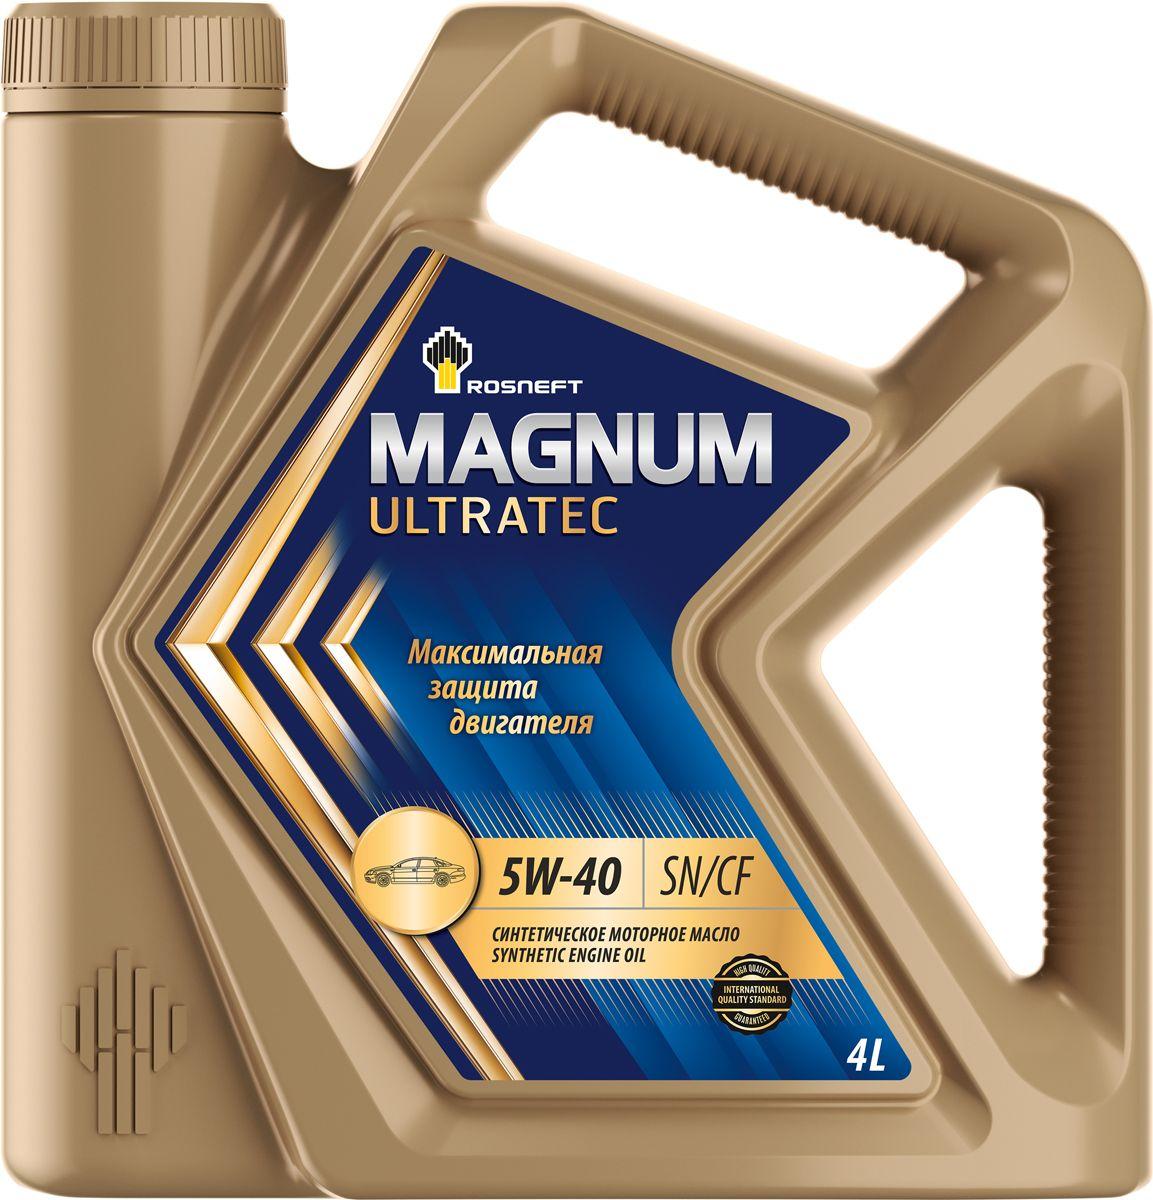 Роснефть Magnum Ultratec 5W-40 4 л